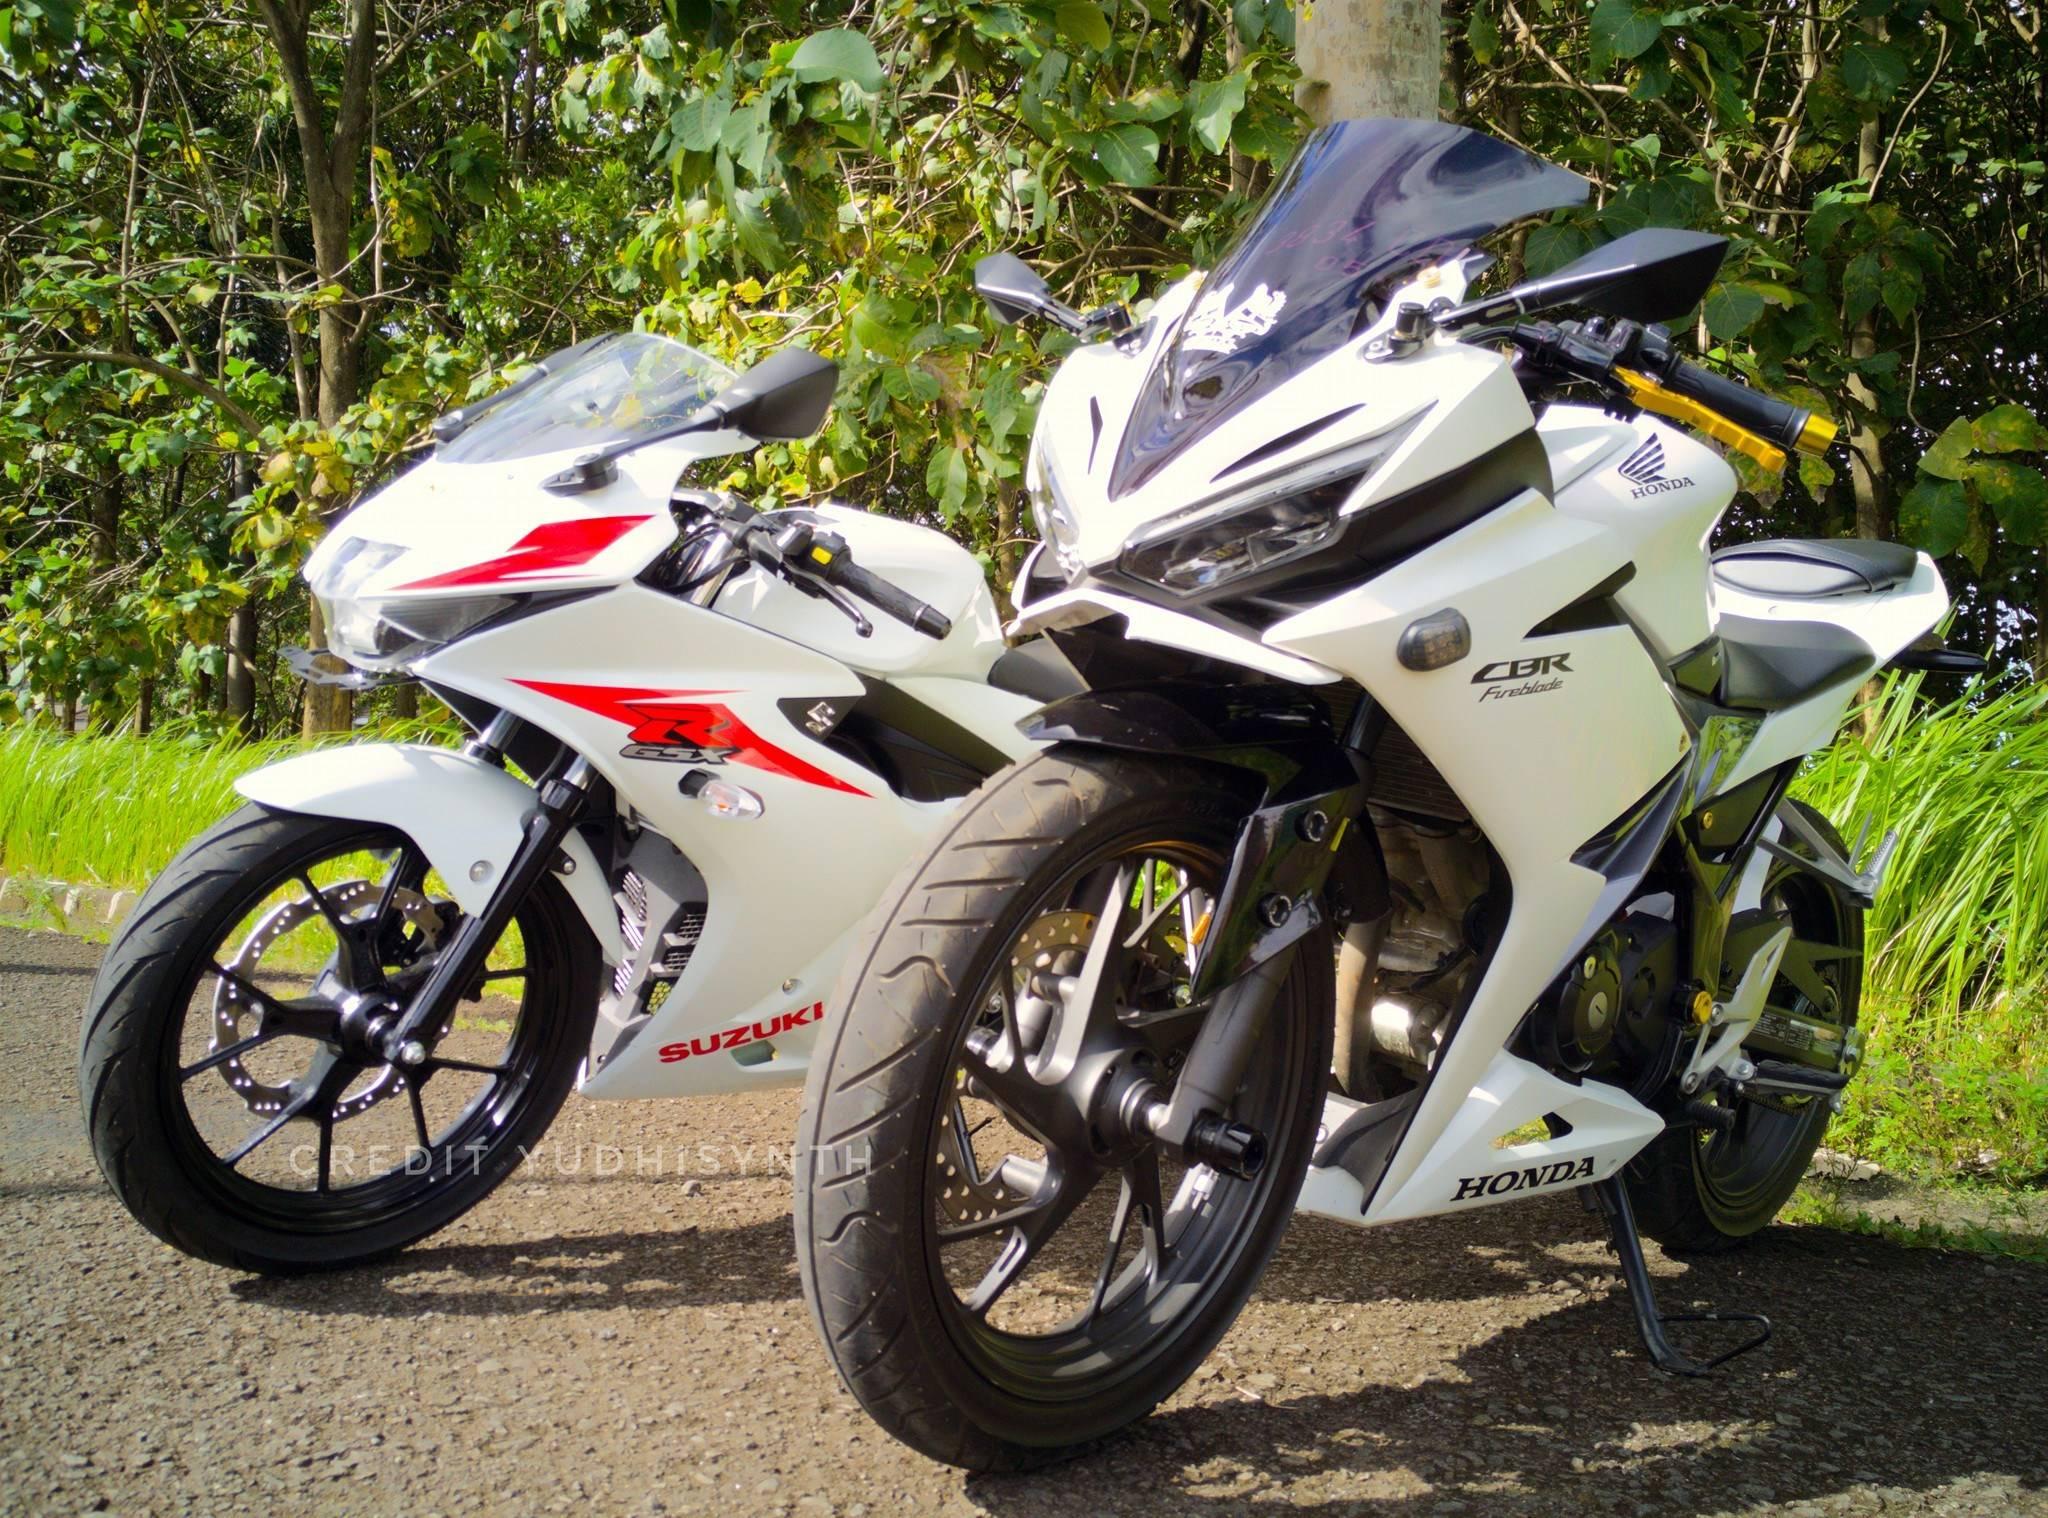 Perbandingan Fisik Suzuki GSX R150 Dan Honda CBR150R WARUNGASEP